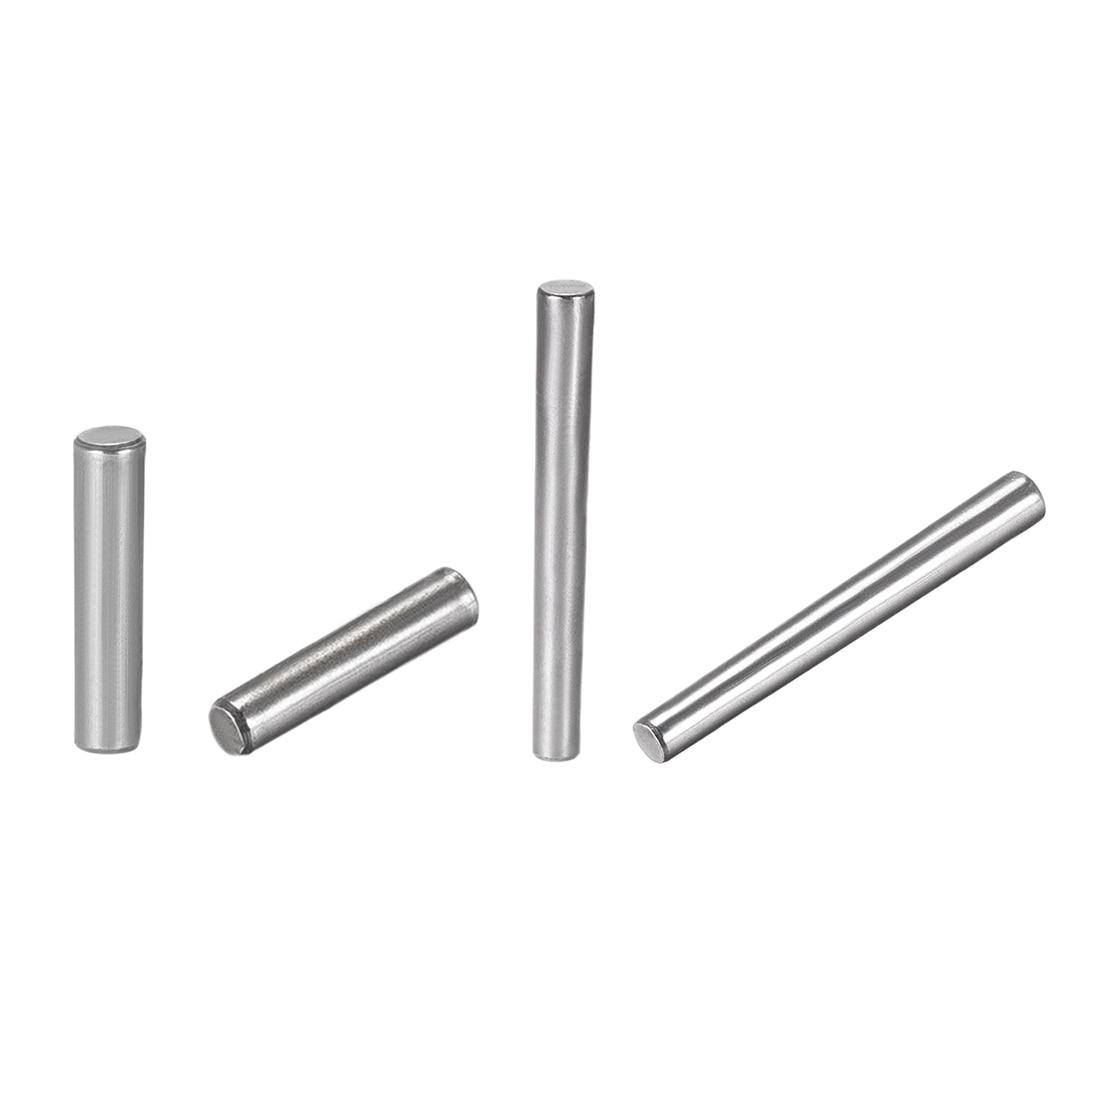 uxcell 10Pcs M3 M4 M5 M6 M8 M10 Small End Diameter Carbon Steel Dowel Pins 20mm-50mm Length 1:50 Taper Pin